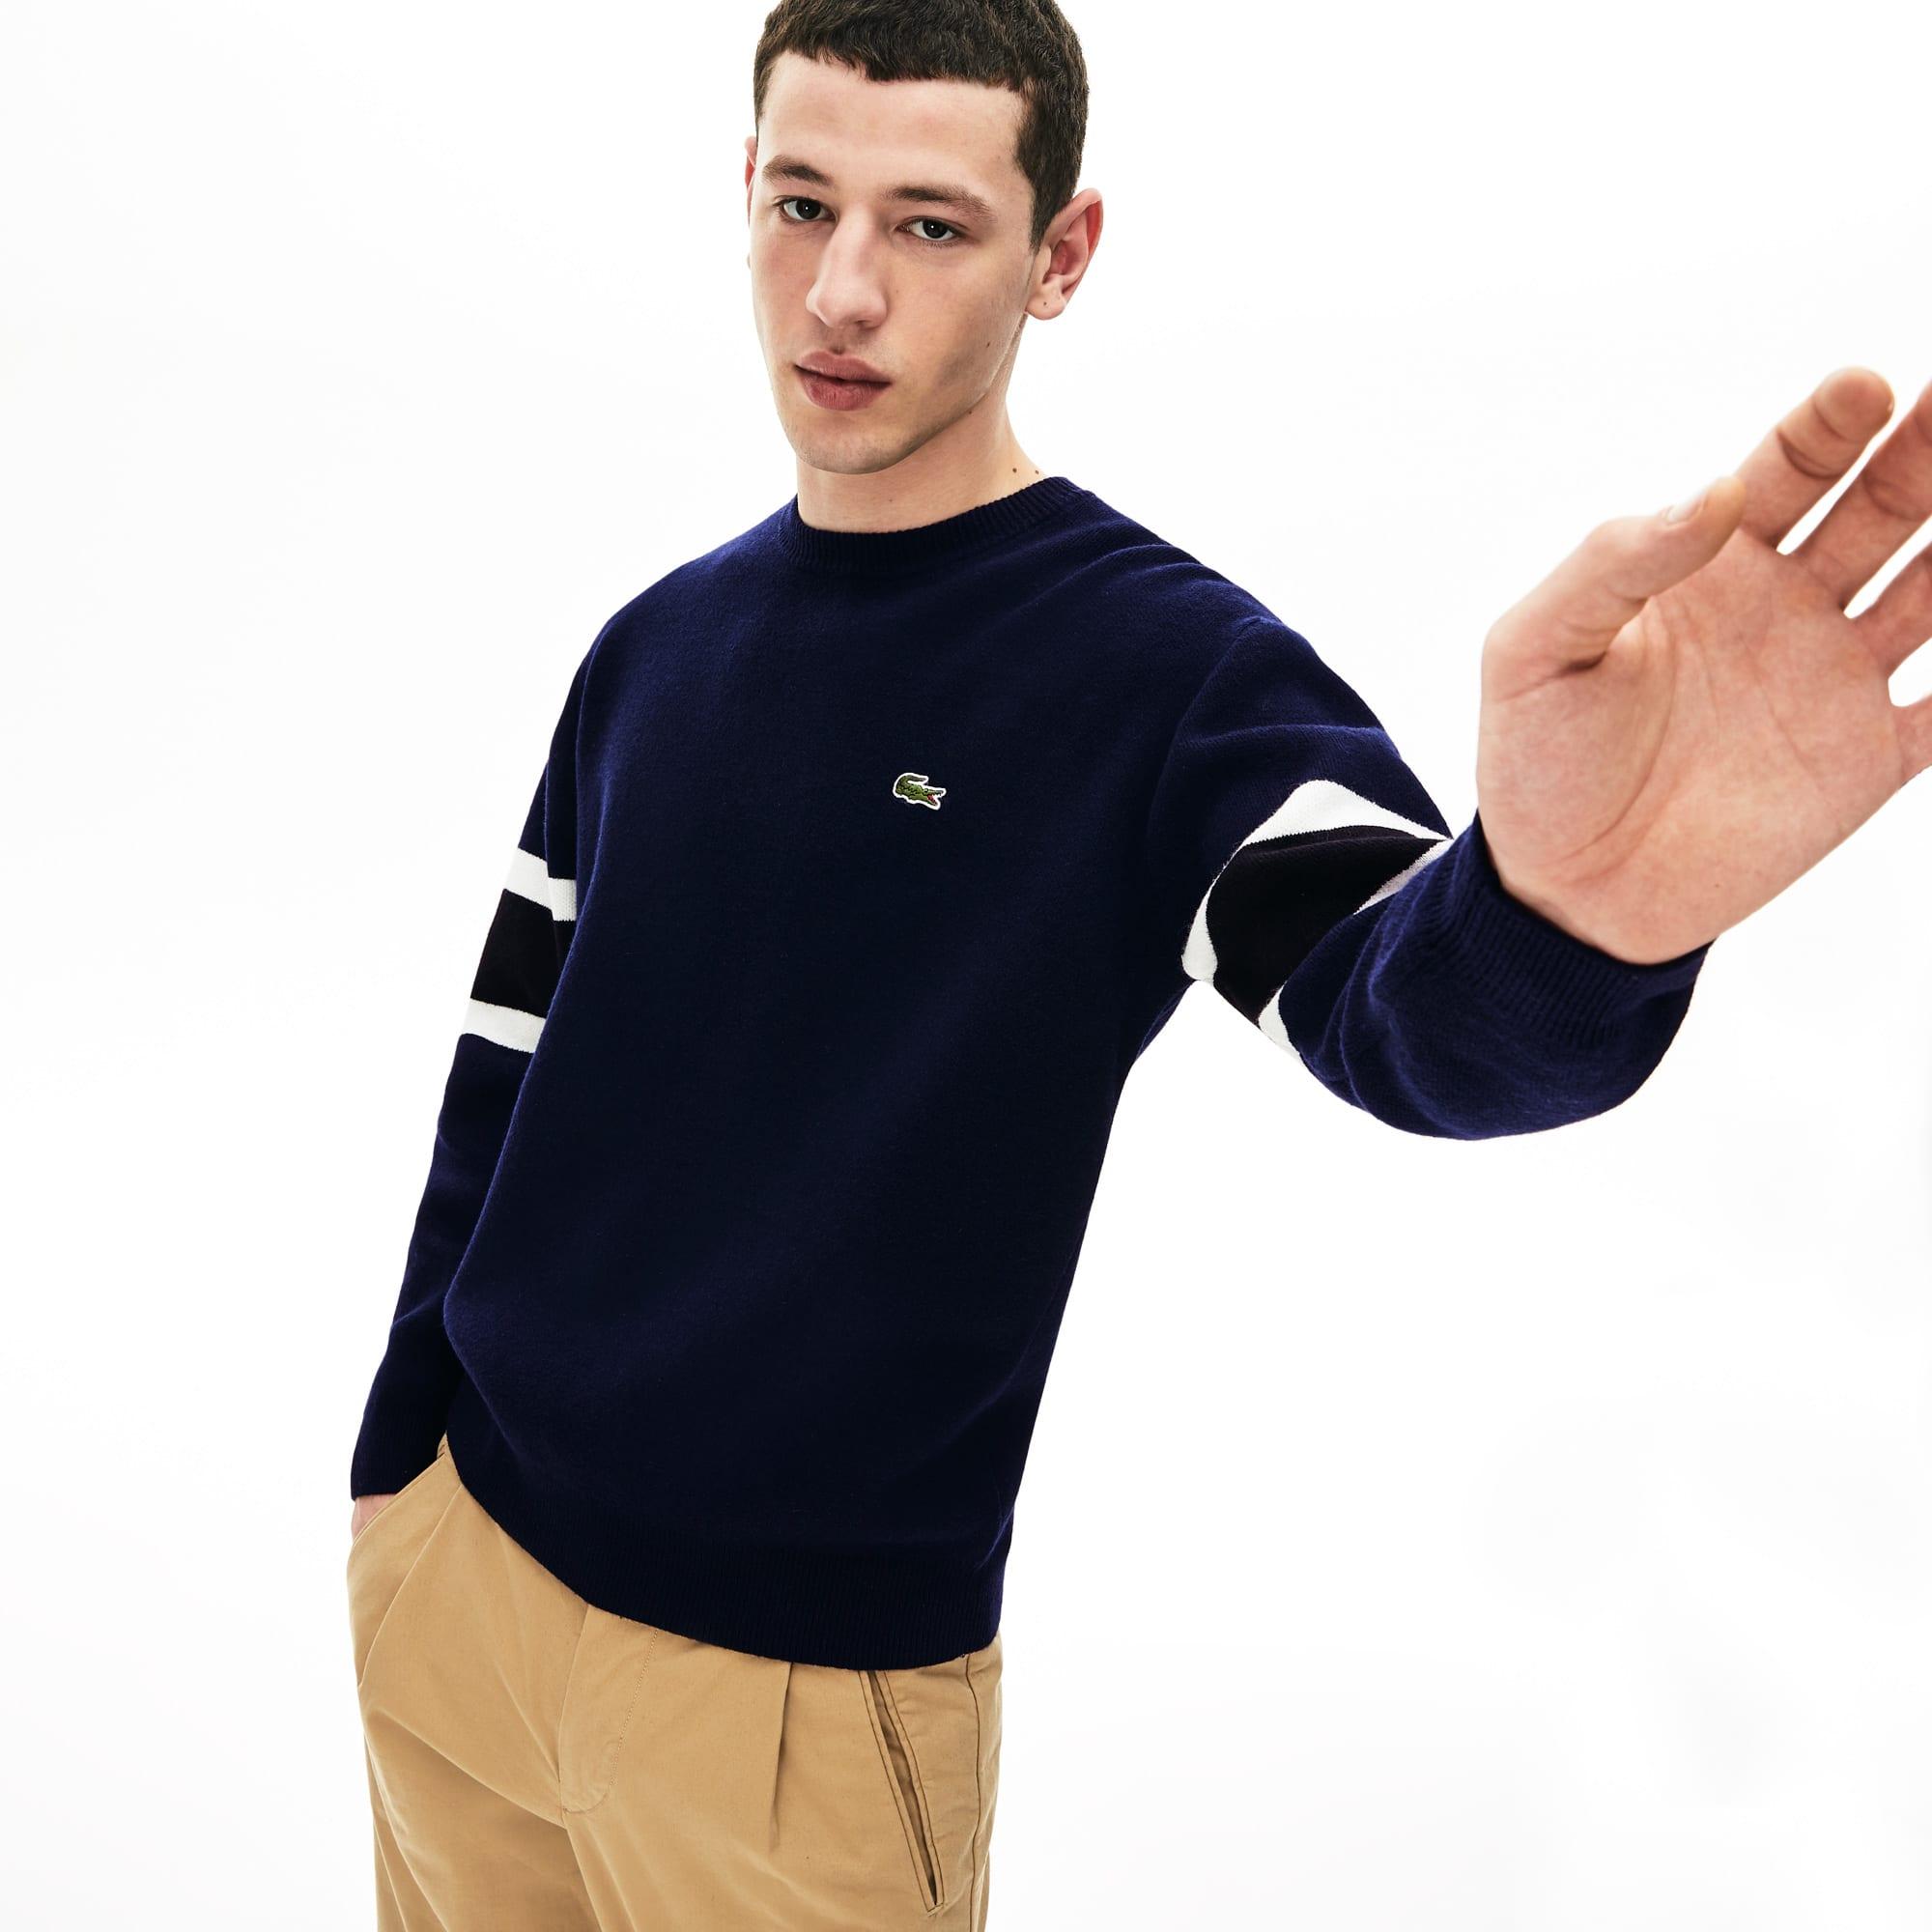 Lacoste Lingerie Men's Crewneck Striped-Sleeve Heathered Jacquard Sweater